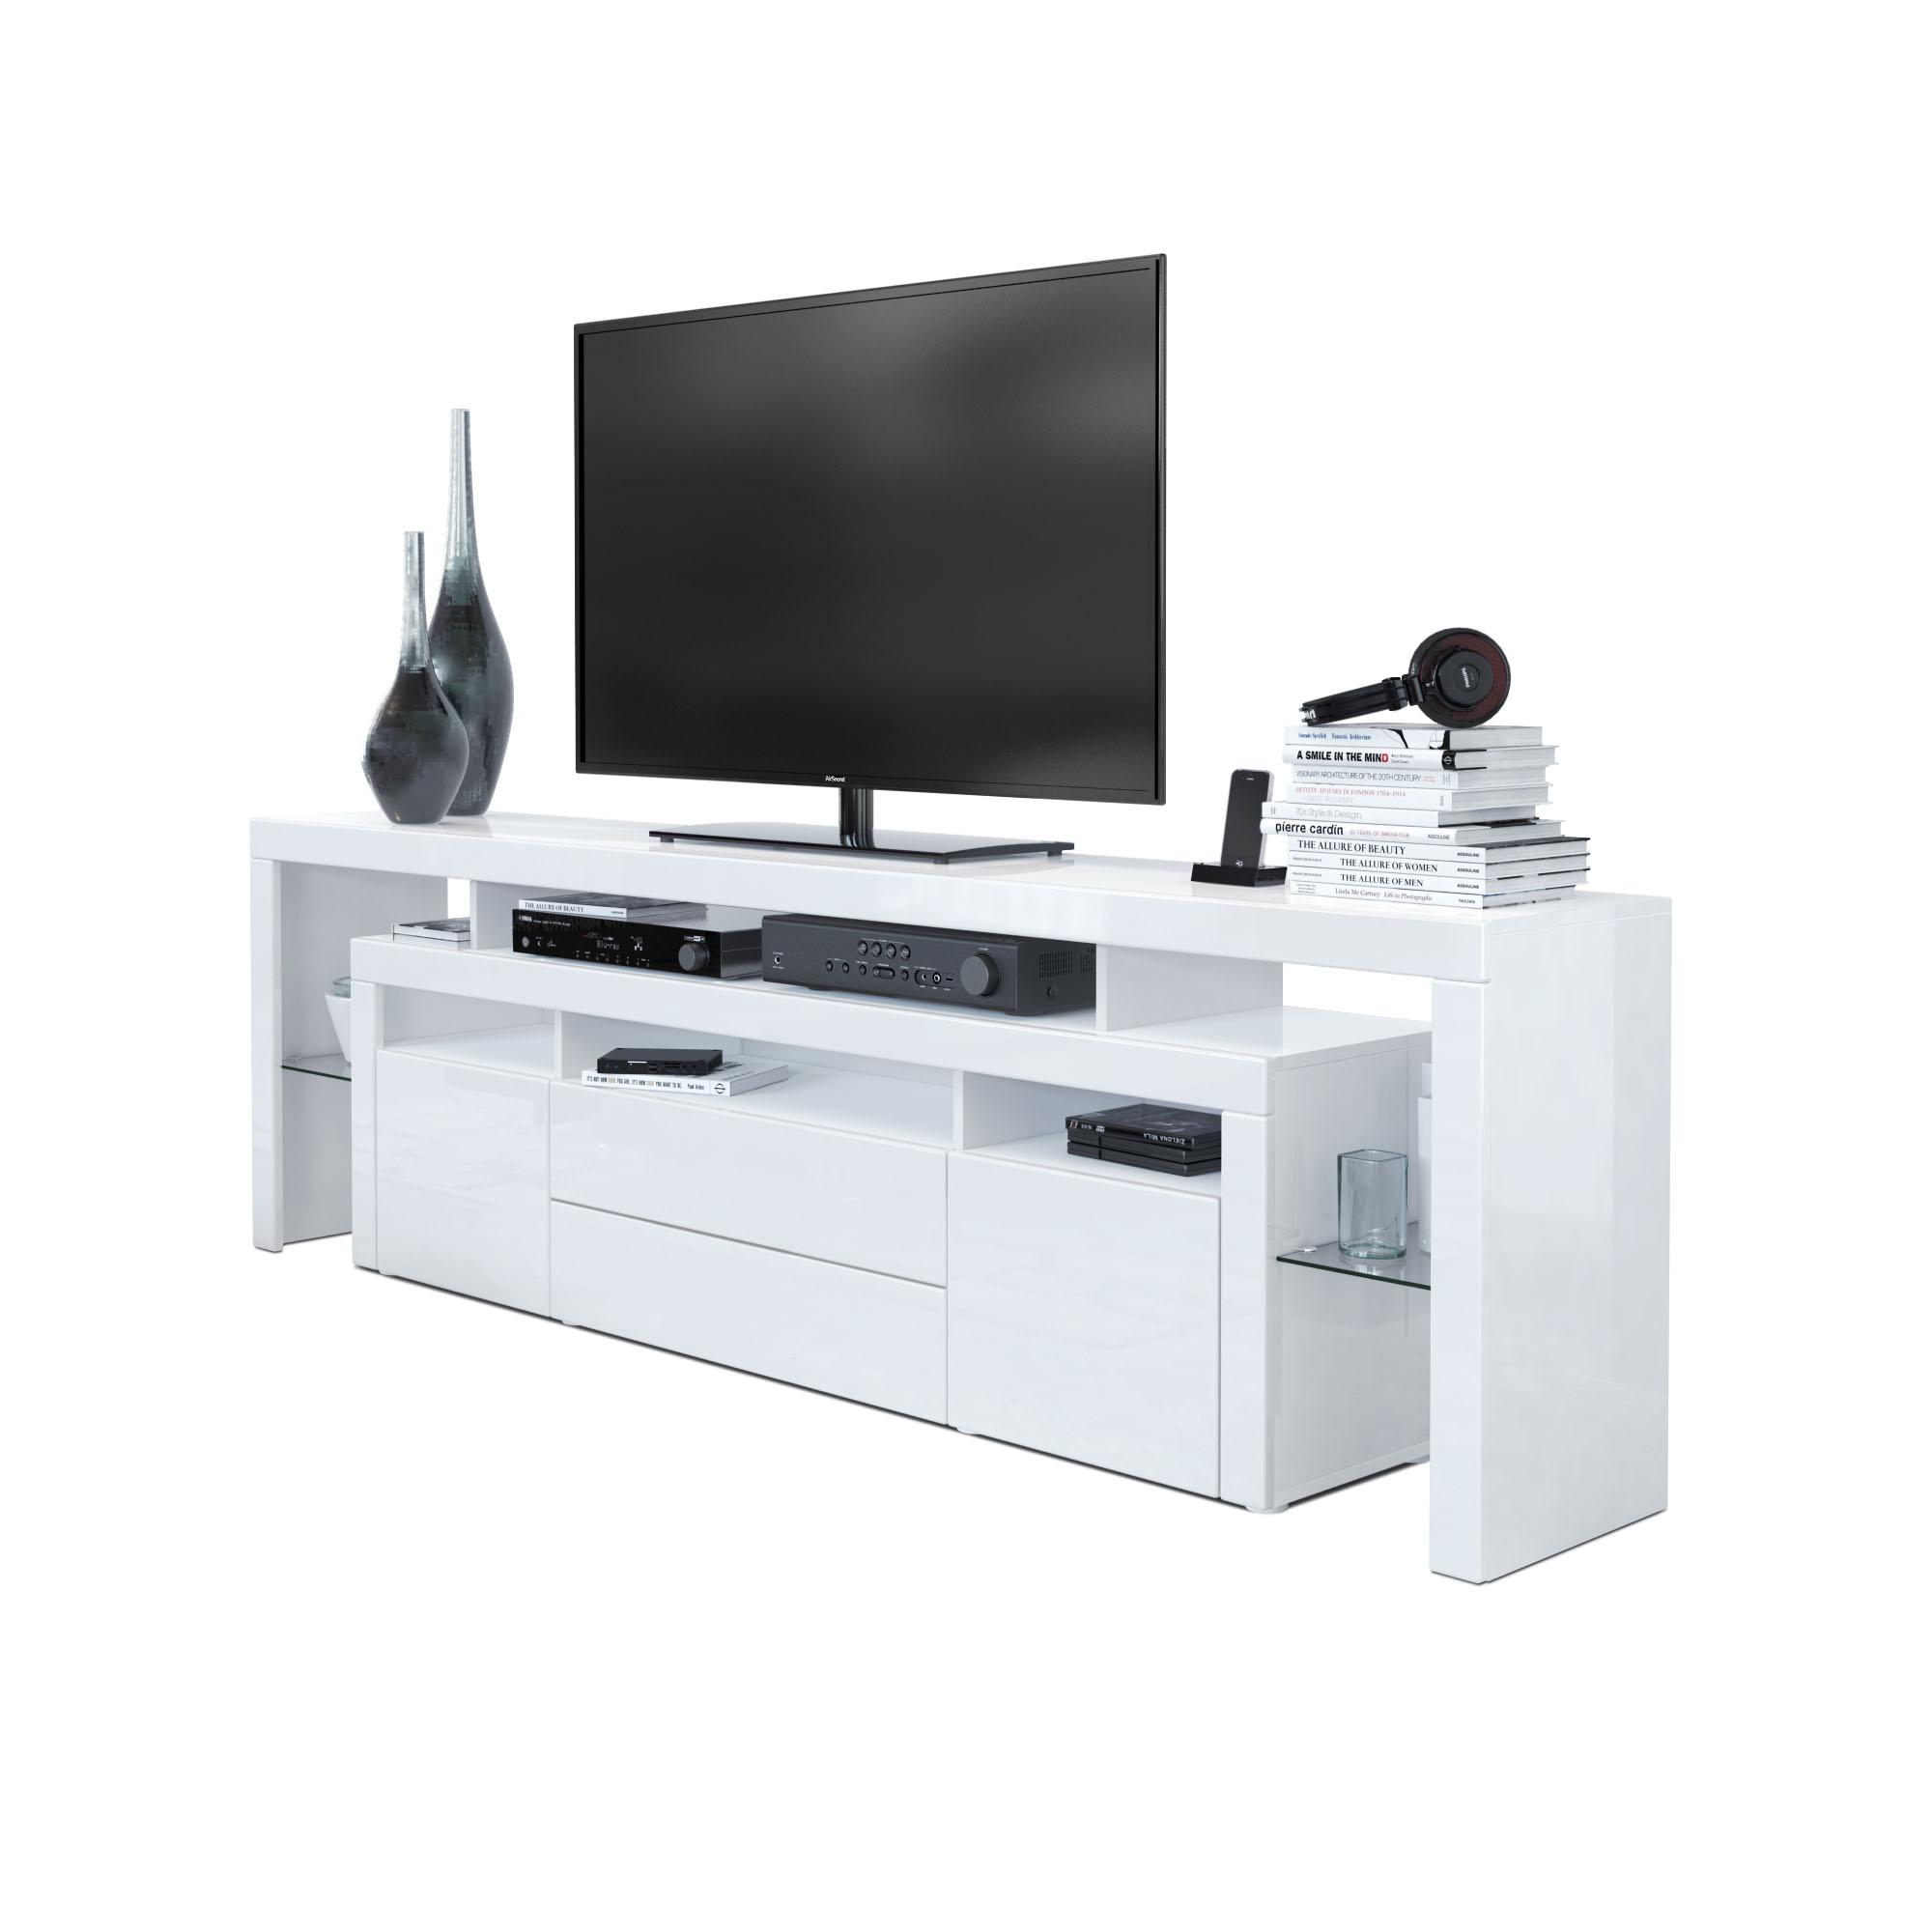 tv lowboard board schrank m bel rosario 220 in wei schwarz hochglanz beton ebay. Black Bedroom Furniture Sets. Home Design Ideas